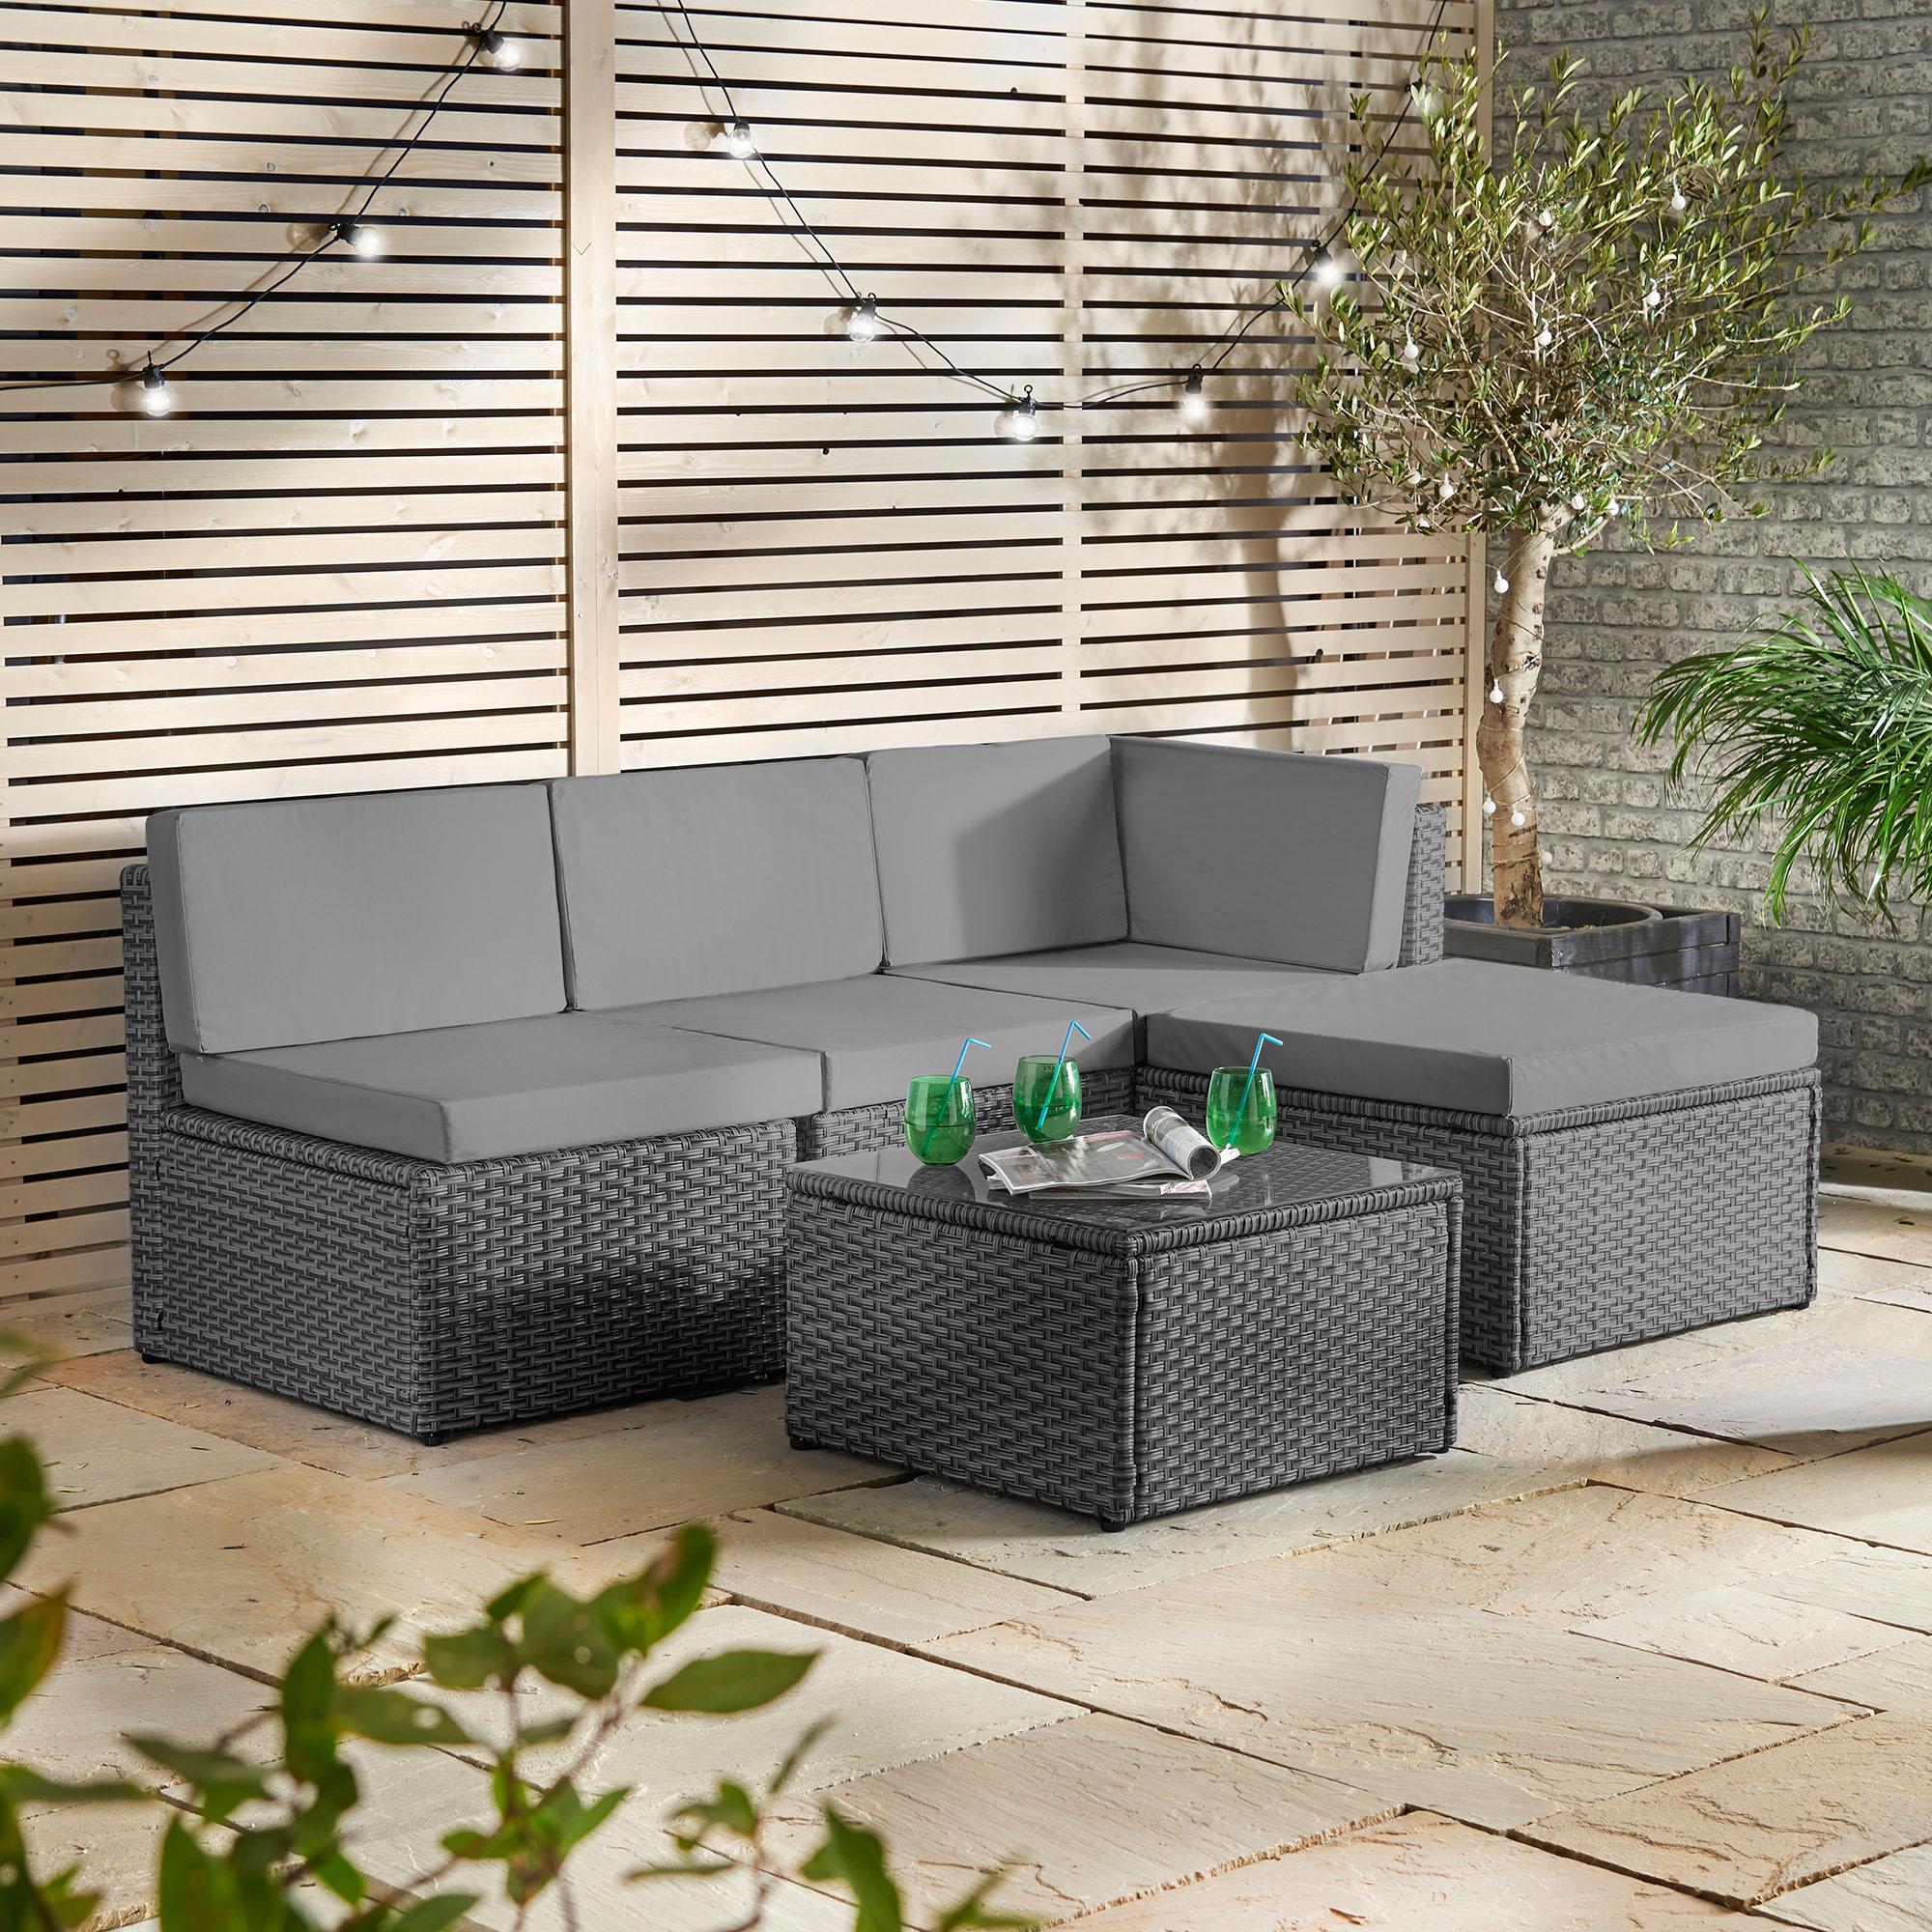 sentinel vonhaus rattan modular sofa set cushioned l shaped lounge dining set for garden - Rattan Garden Furniture L Shape